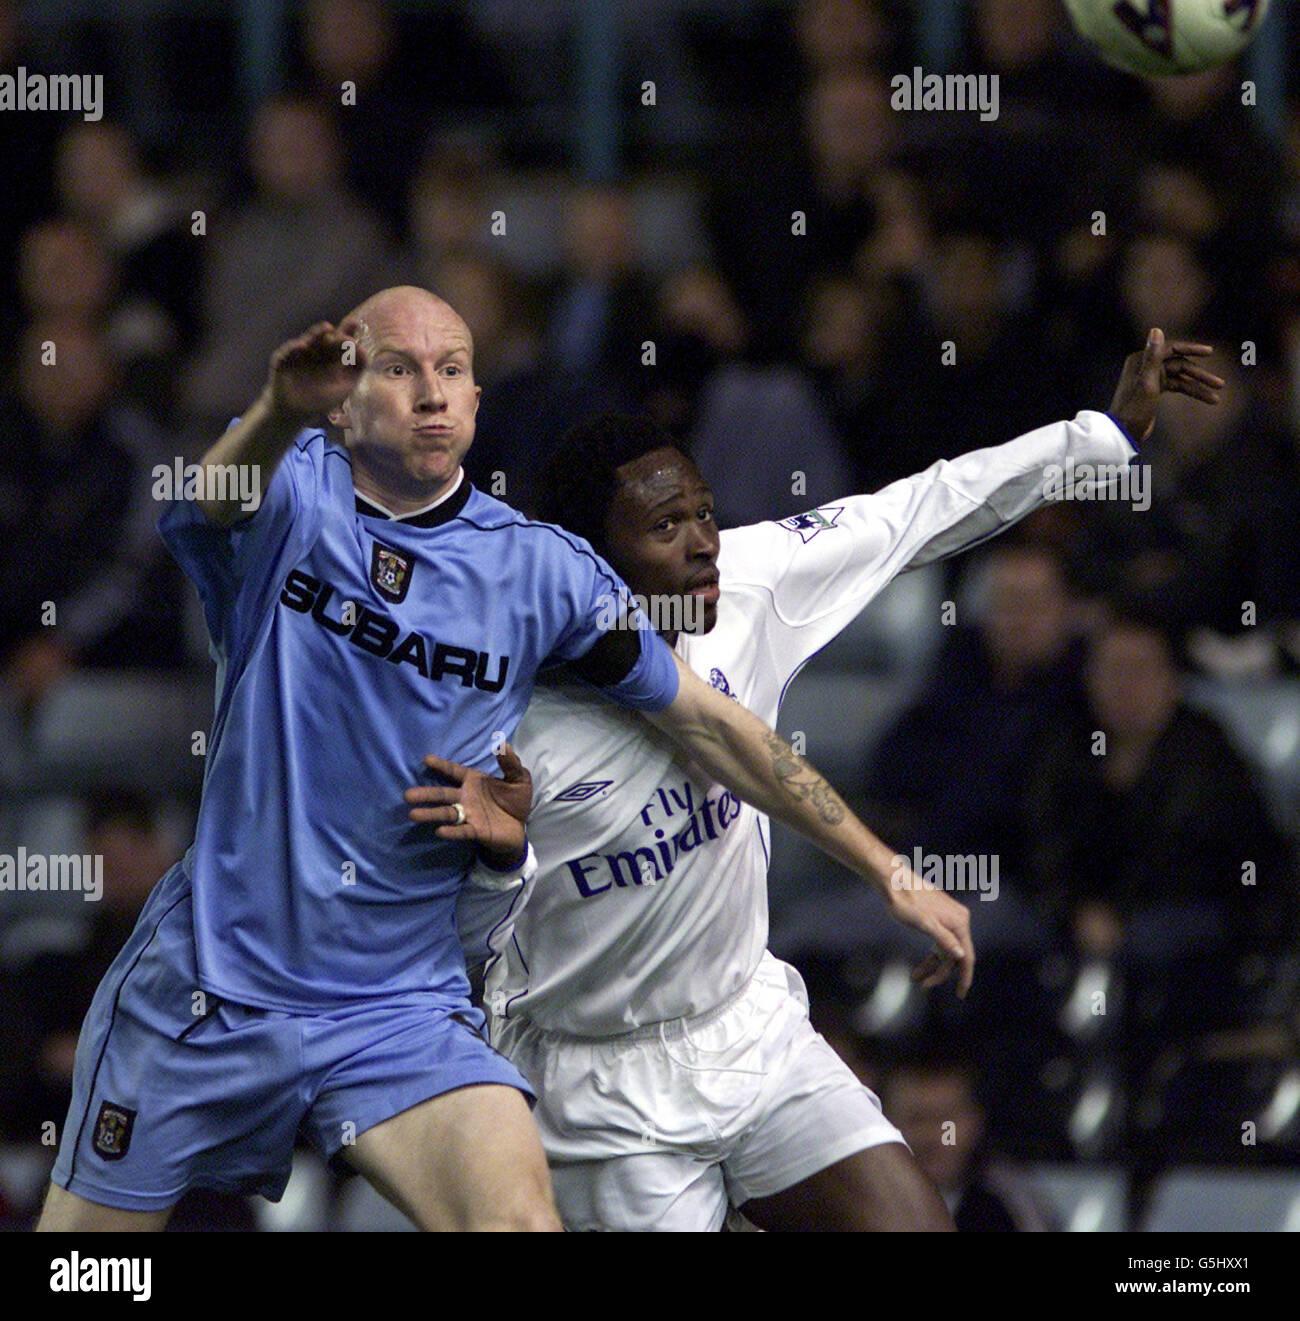 FOOTBALL LEE HUGHES/CELESTINE BABAYARO - Stock Image